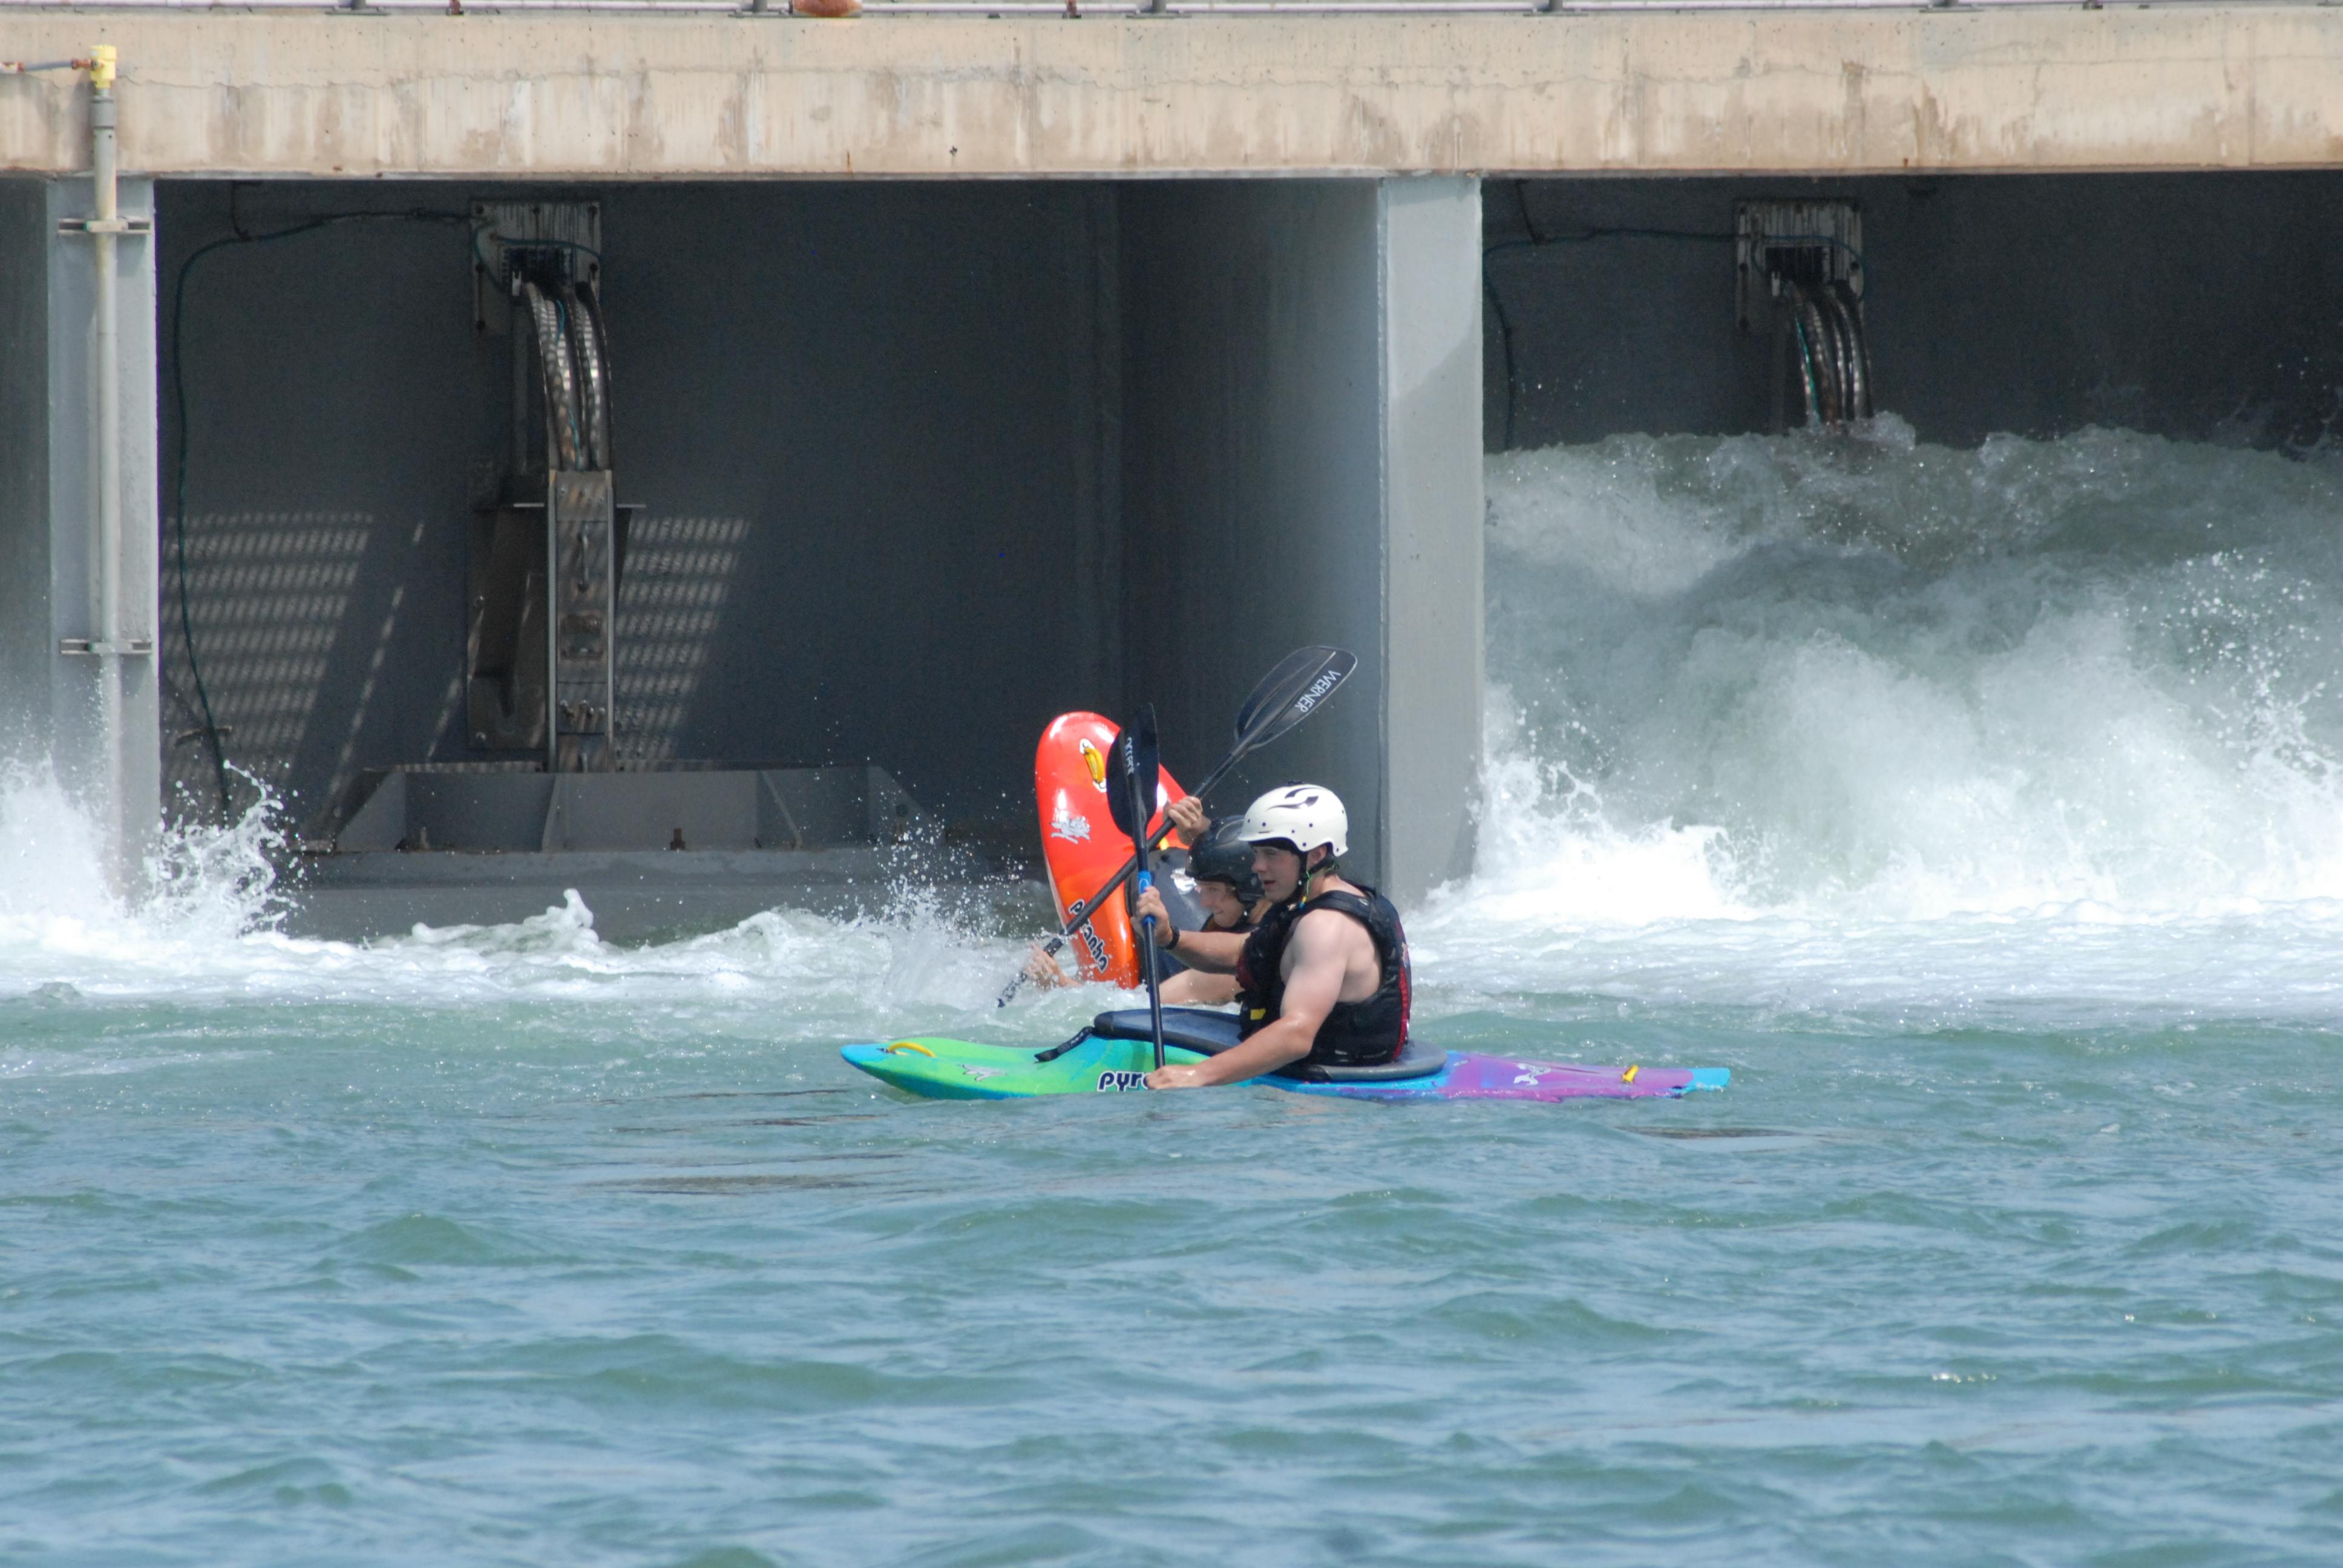 Pyranha Blog » Kayaking Articles from Pyranha Staff, Team